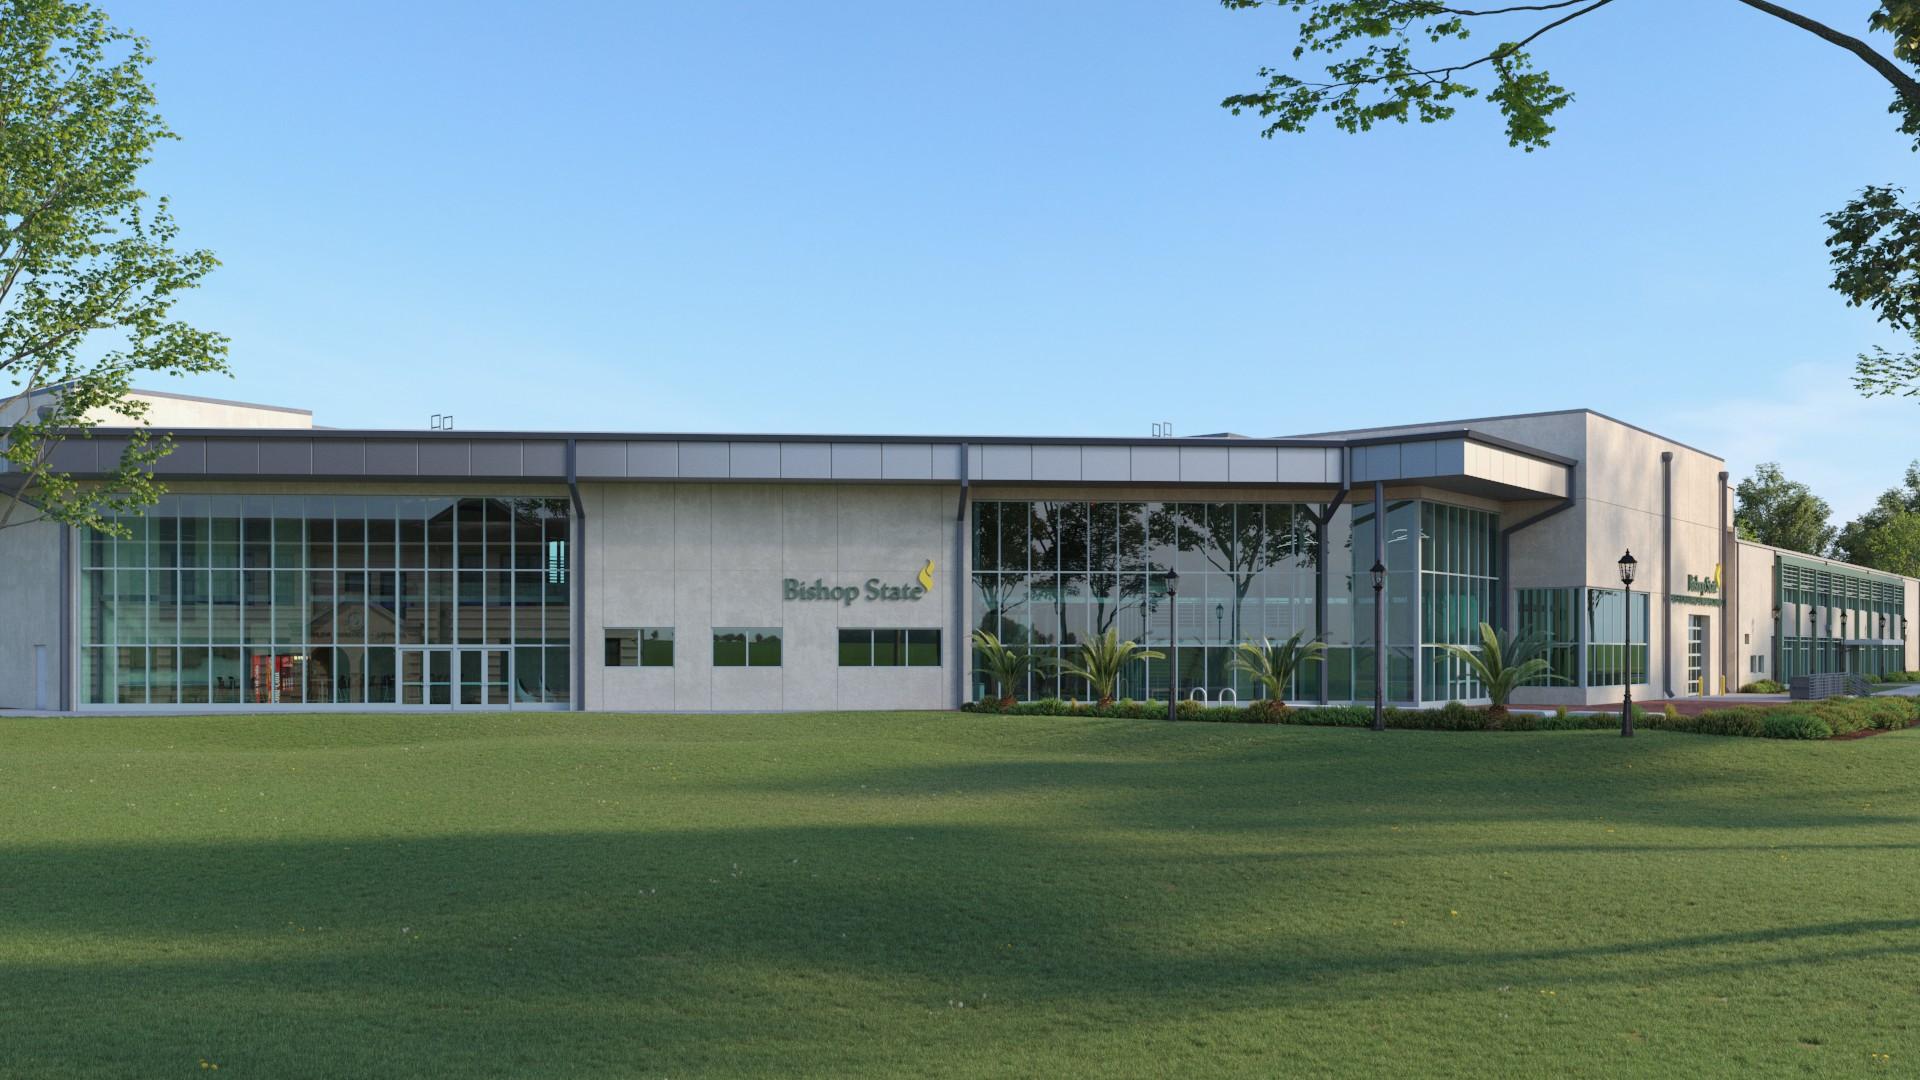 Advanced Manufacturing Center Building - Bishop State Community College - Bishop State Foundation - Mobile AL